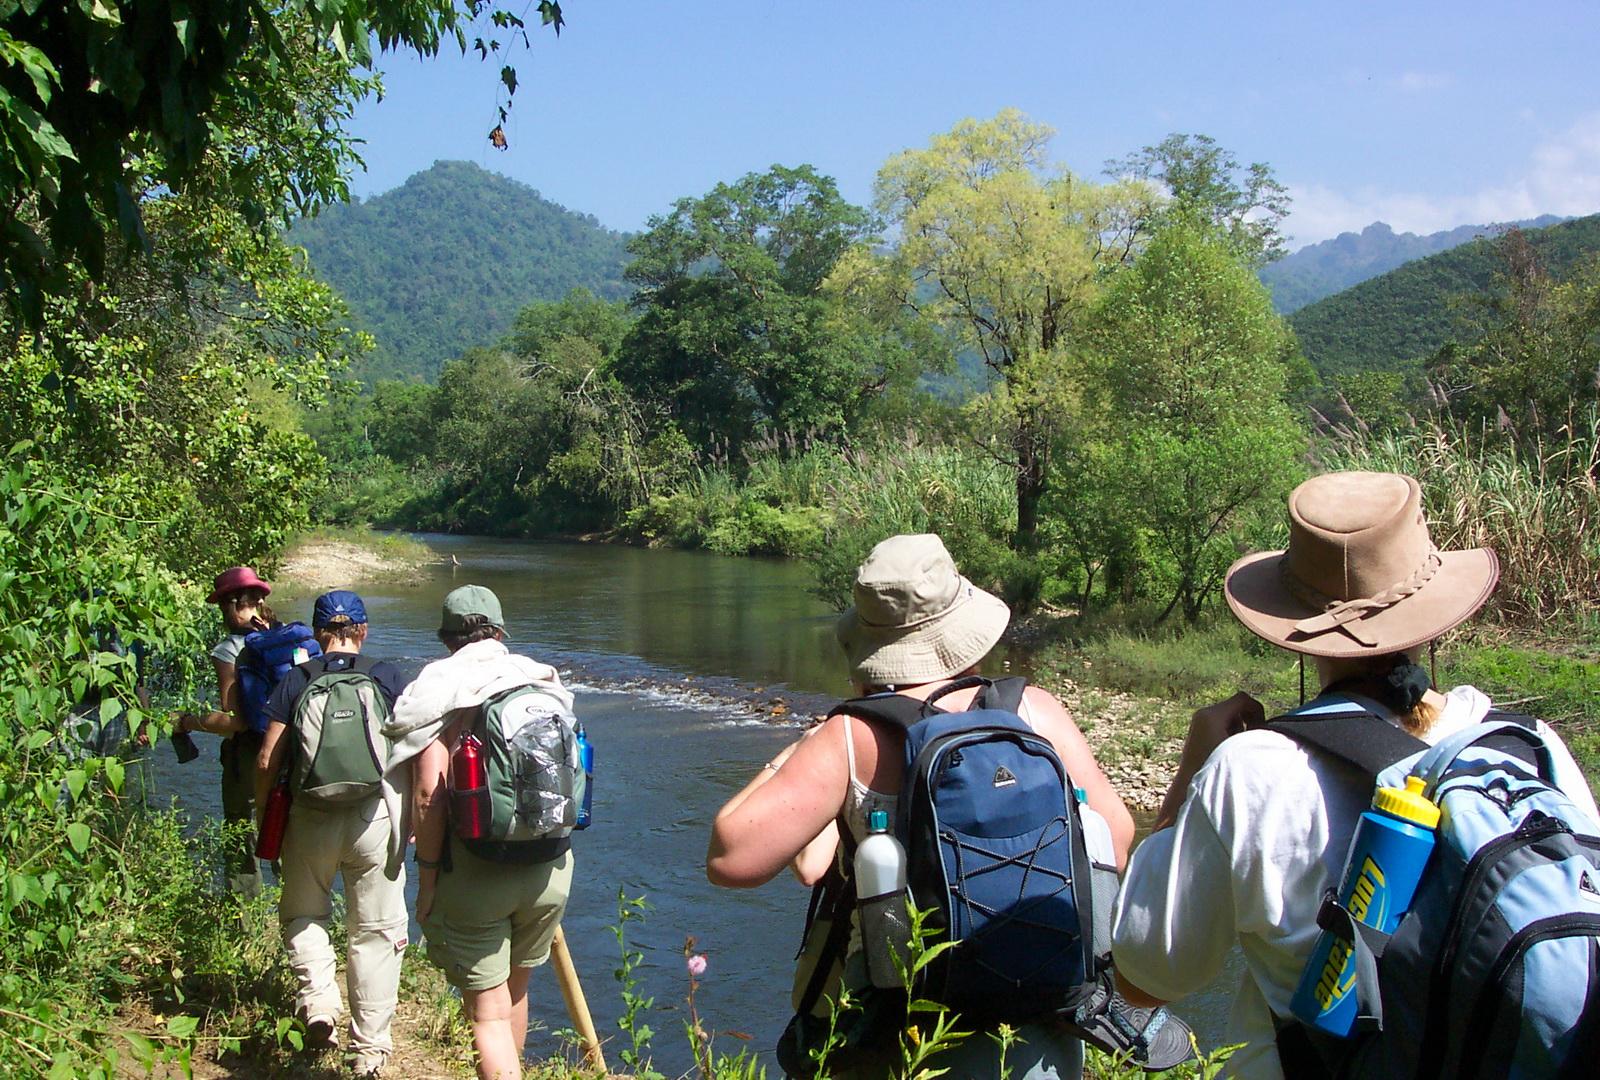 North Thailand Family Tour, a trek through the National Park